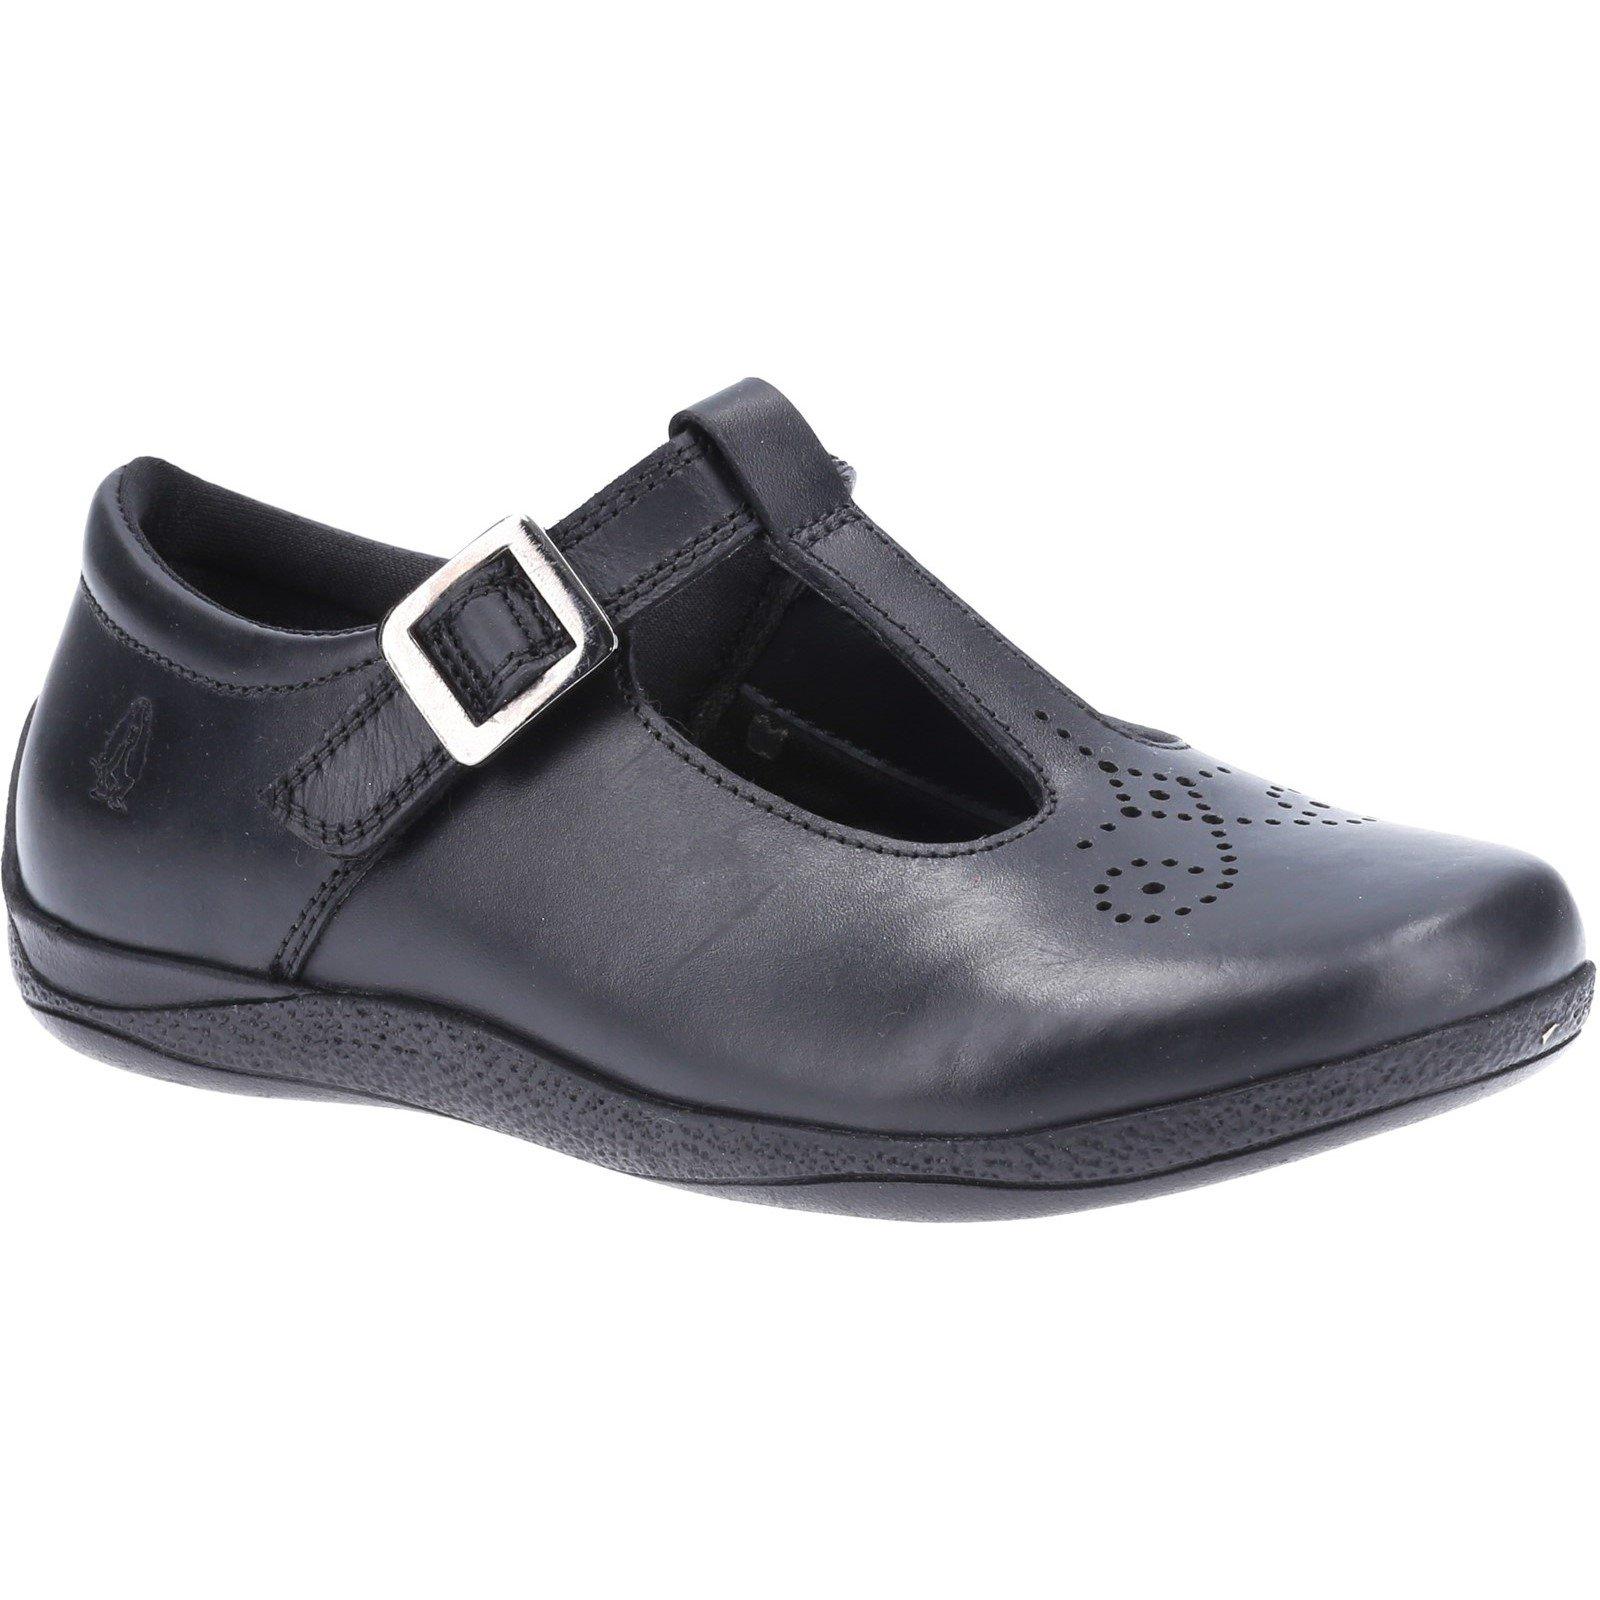 Hush Puppies Kid's Eliza Junior School Shoe Black 32589 - Black 10